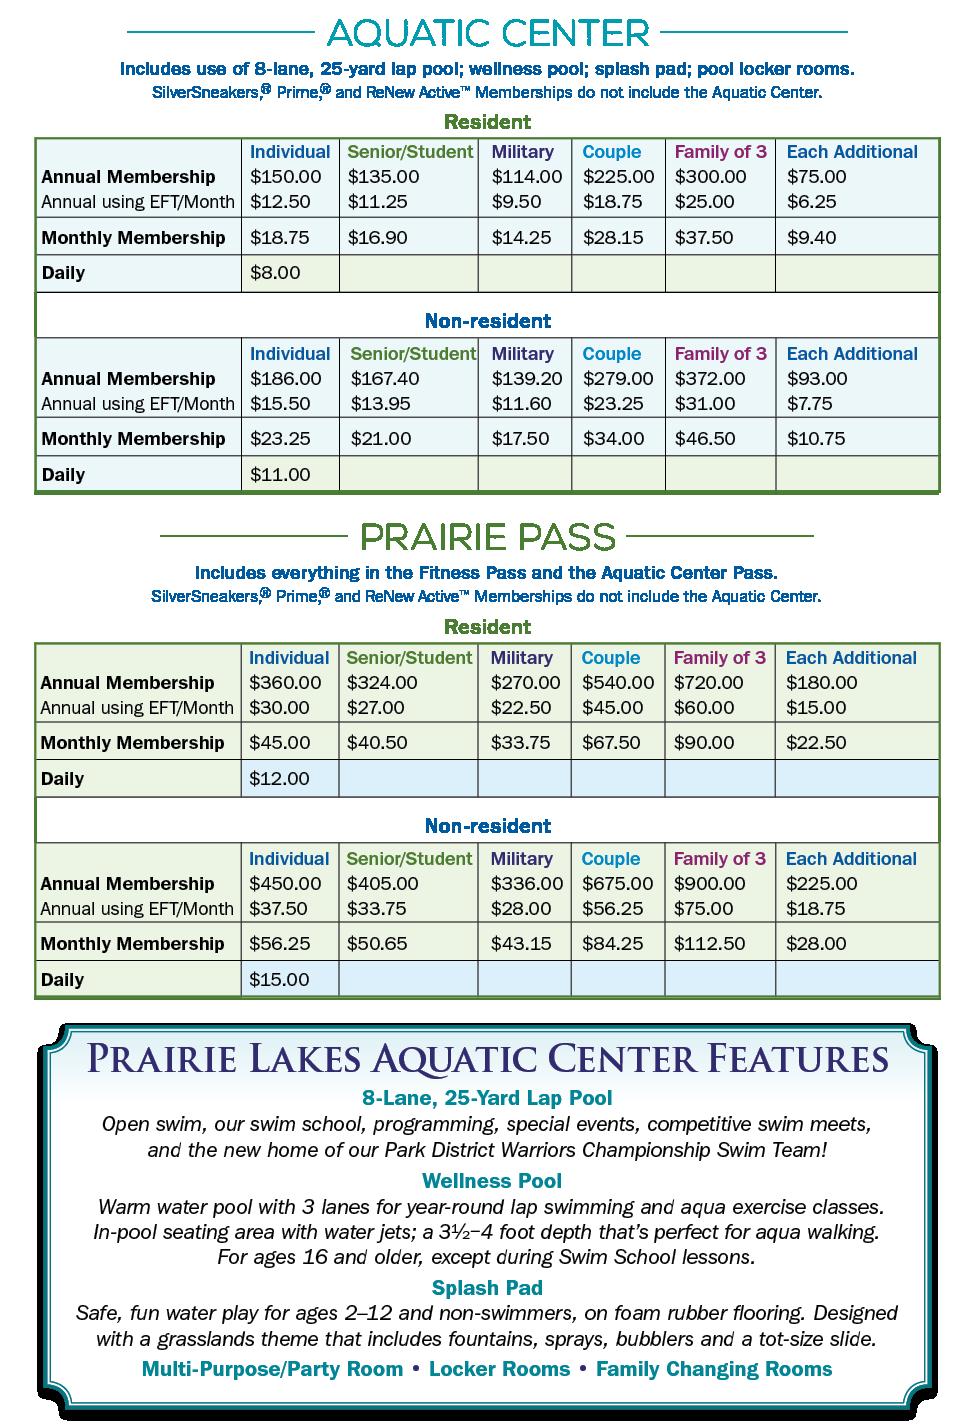 Prairie Lakes Aquatic Center Memberships